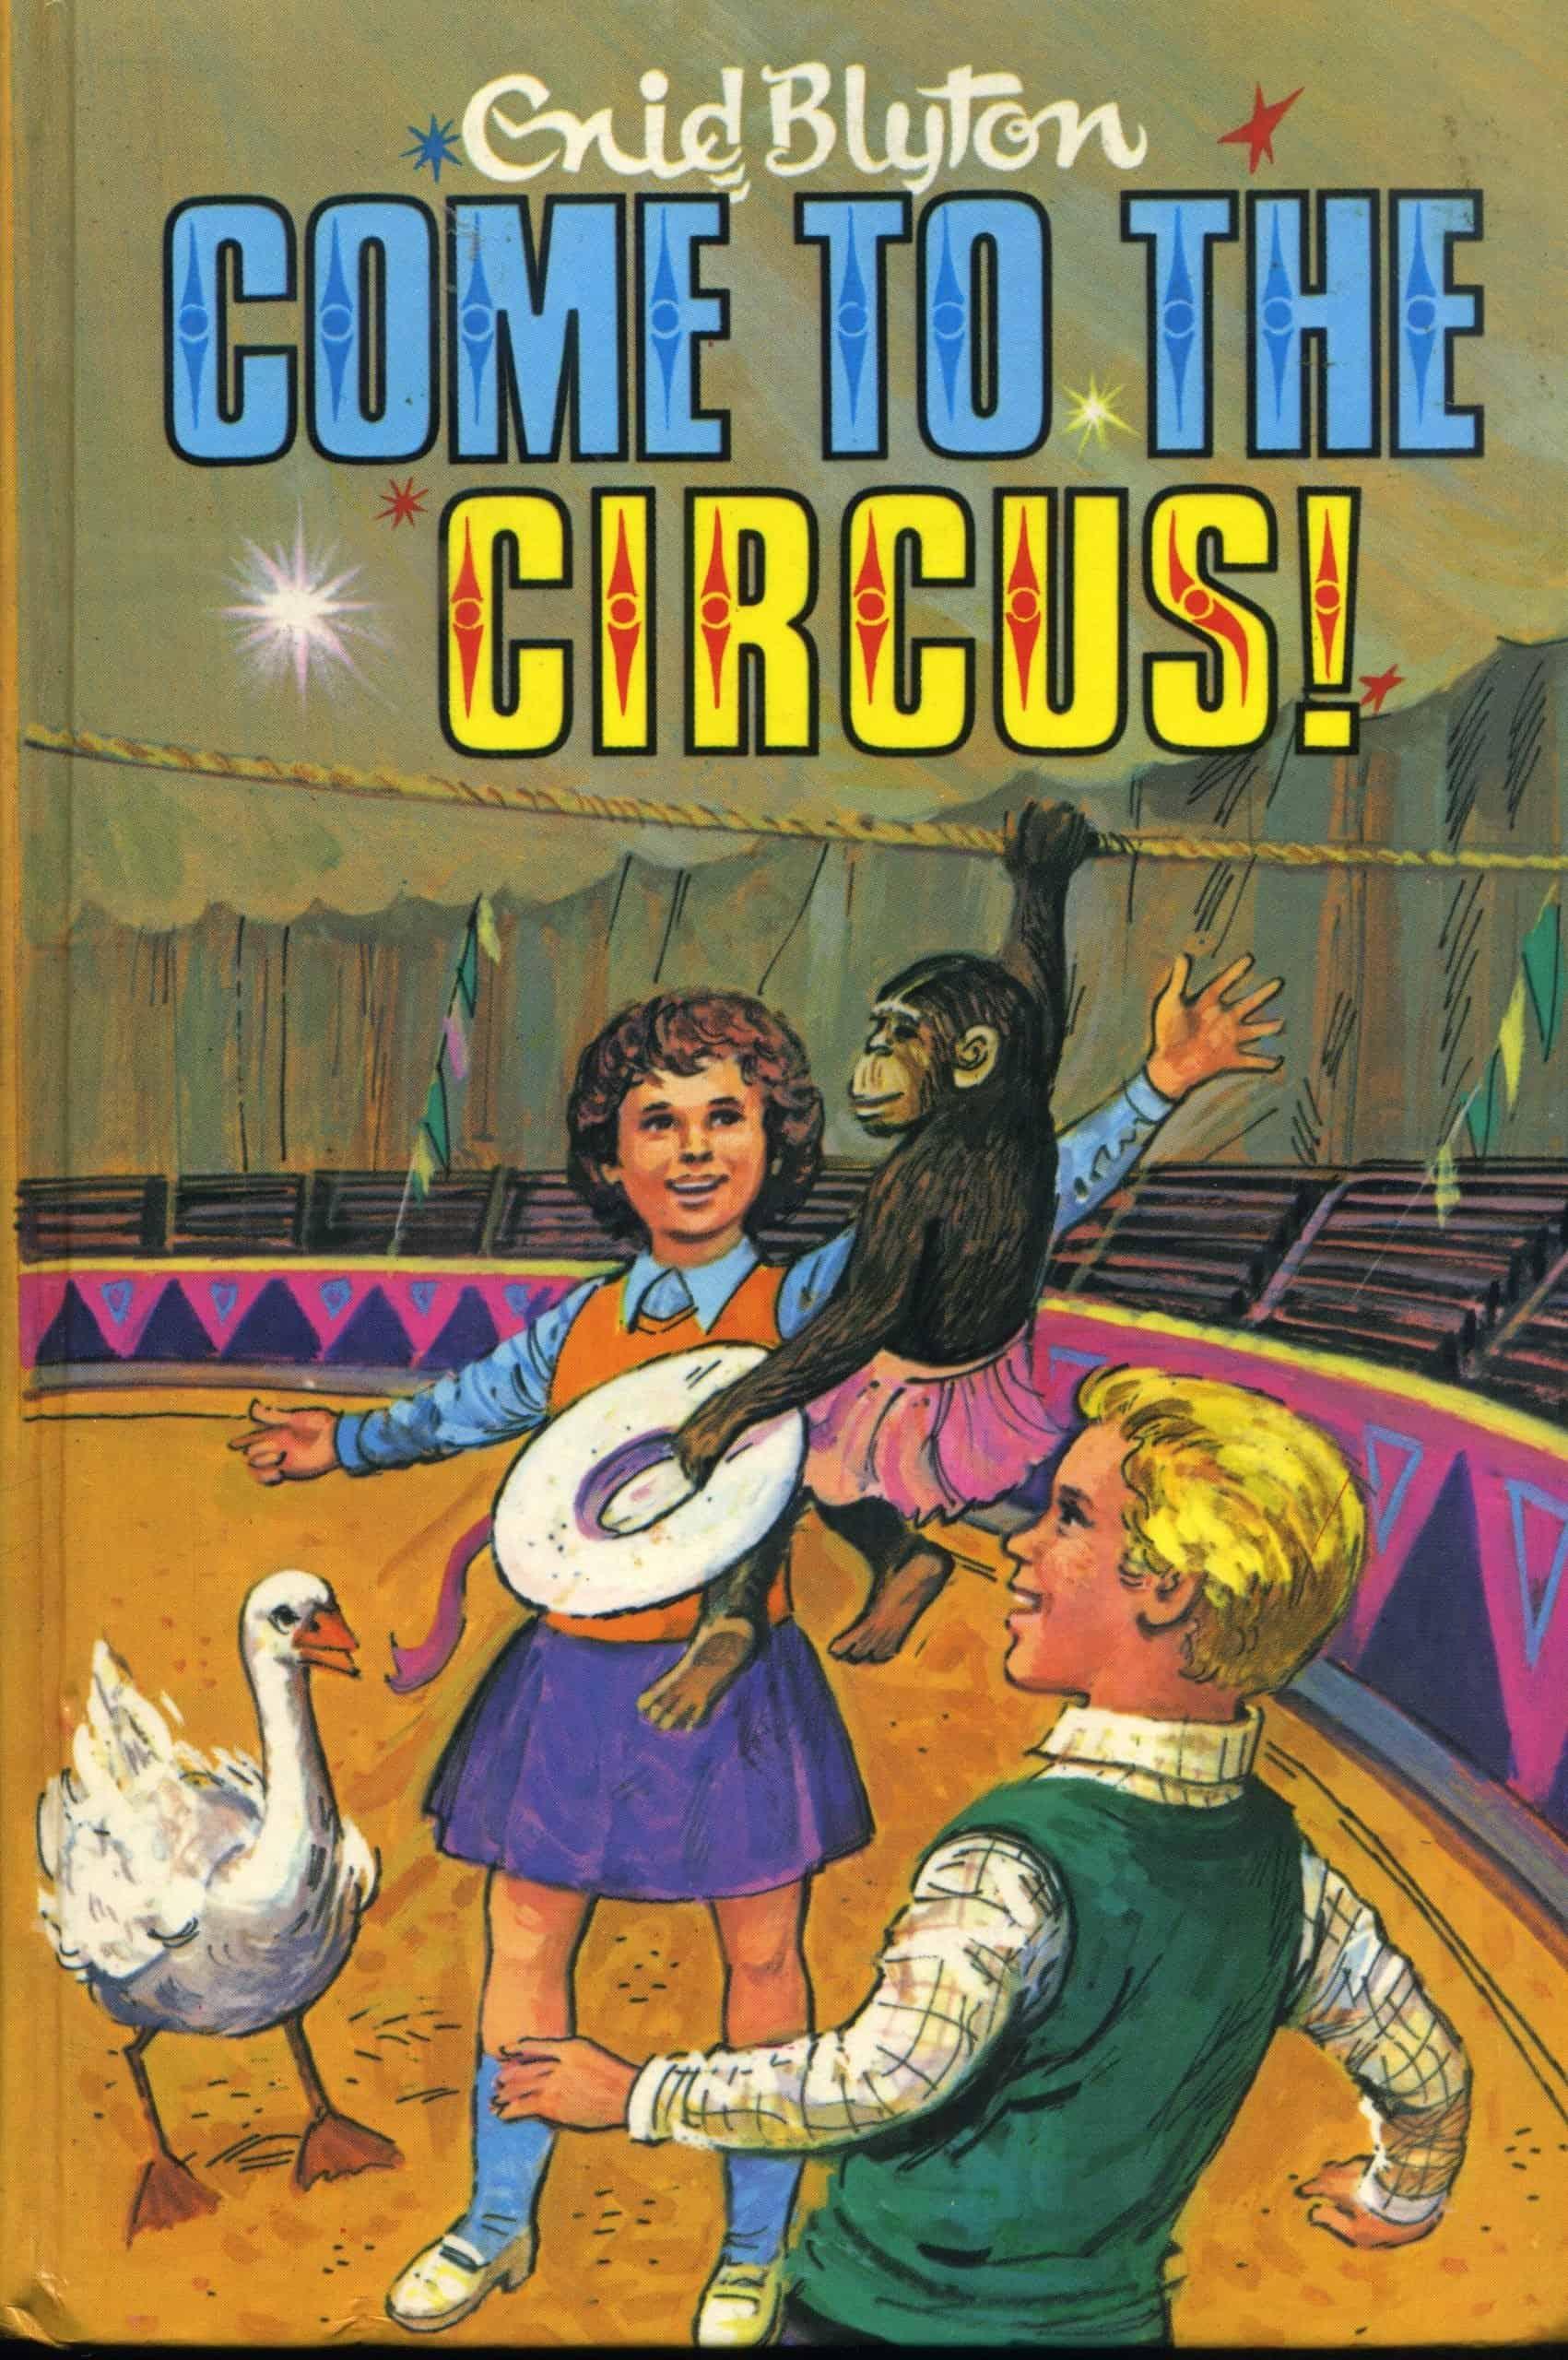 Come to the circus enid blyton book